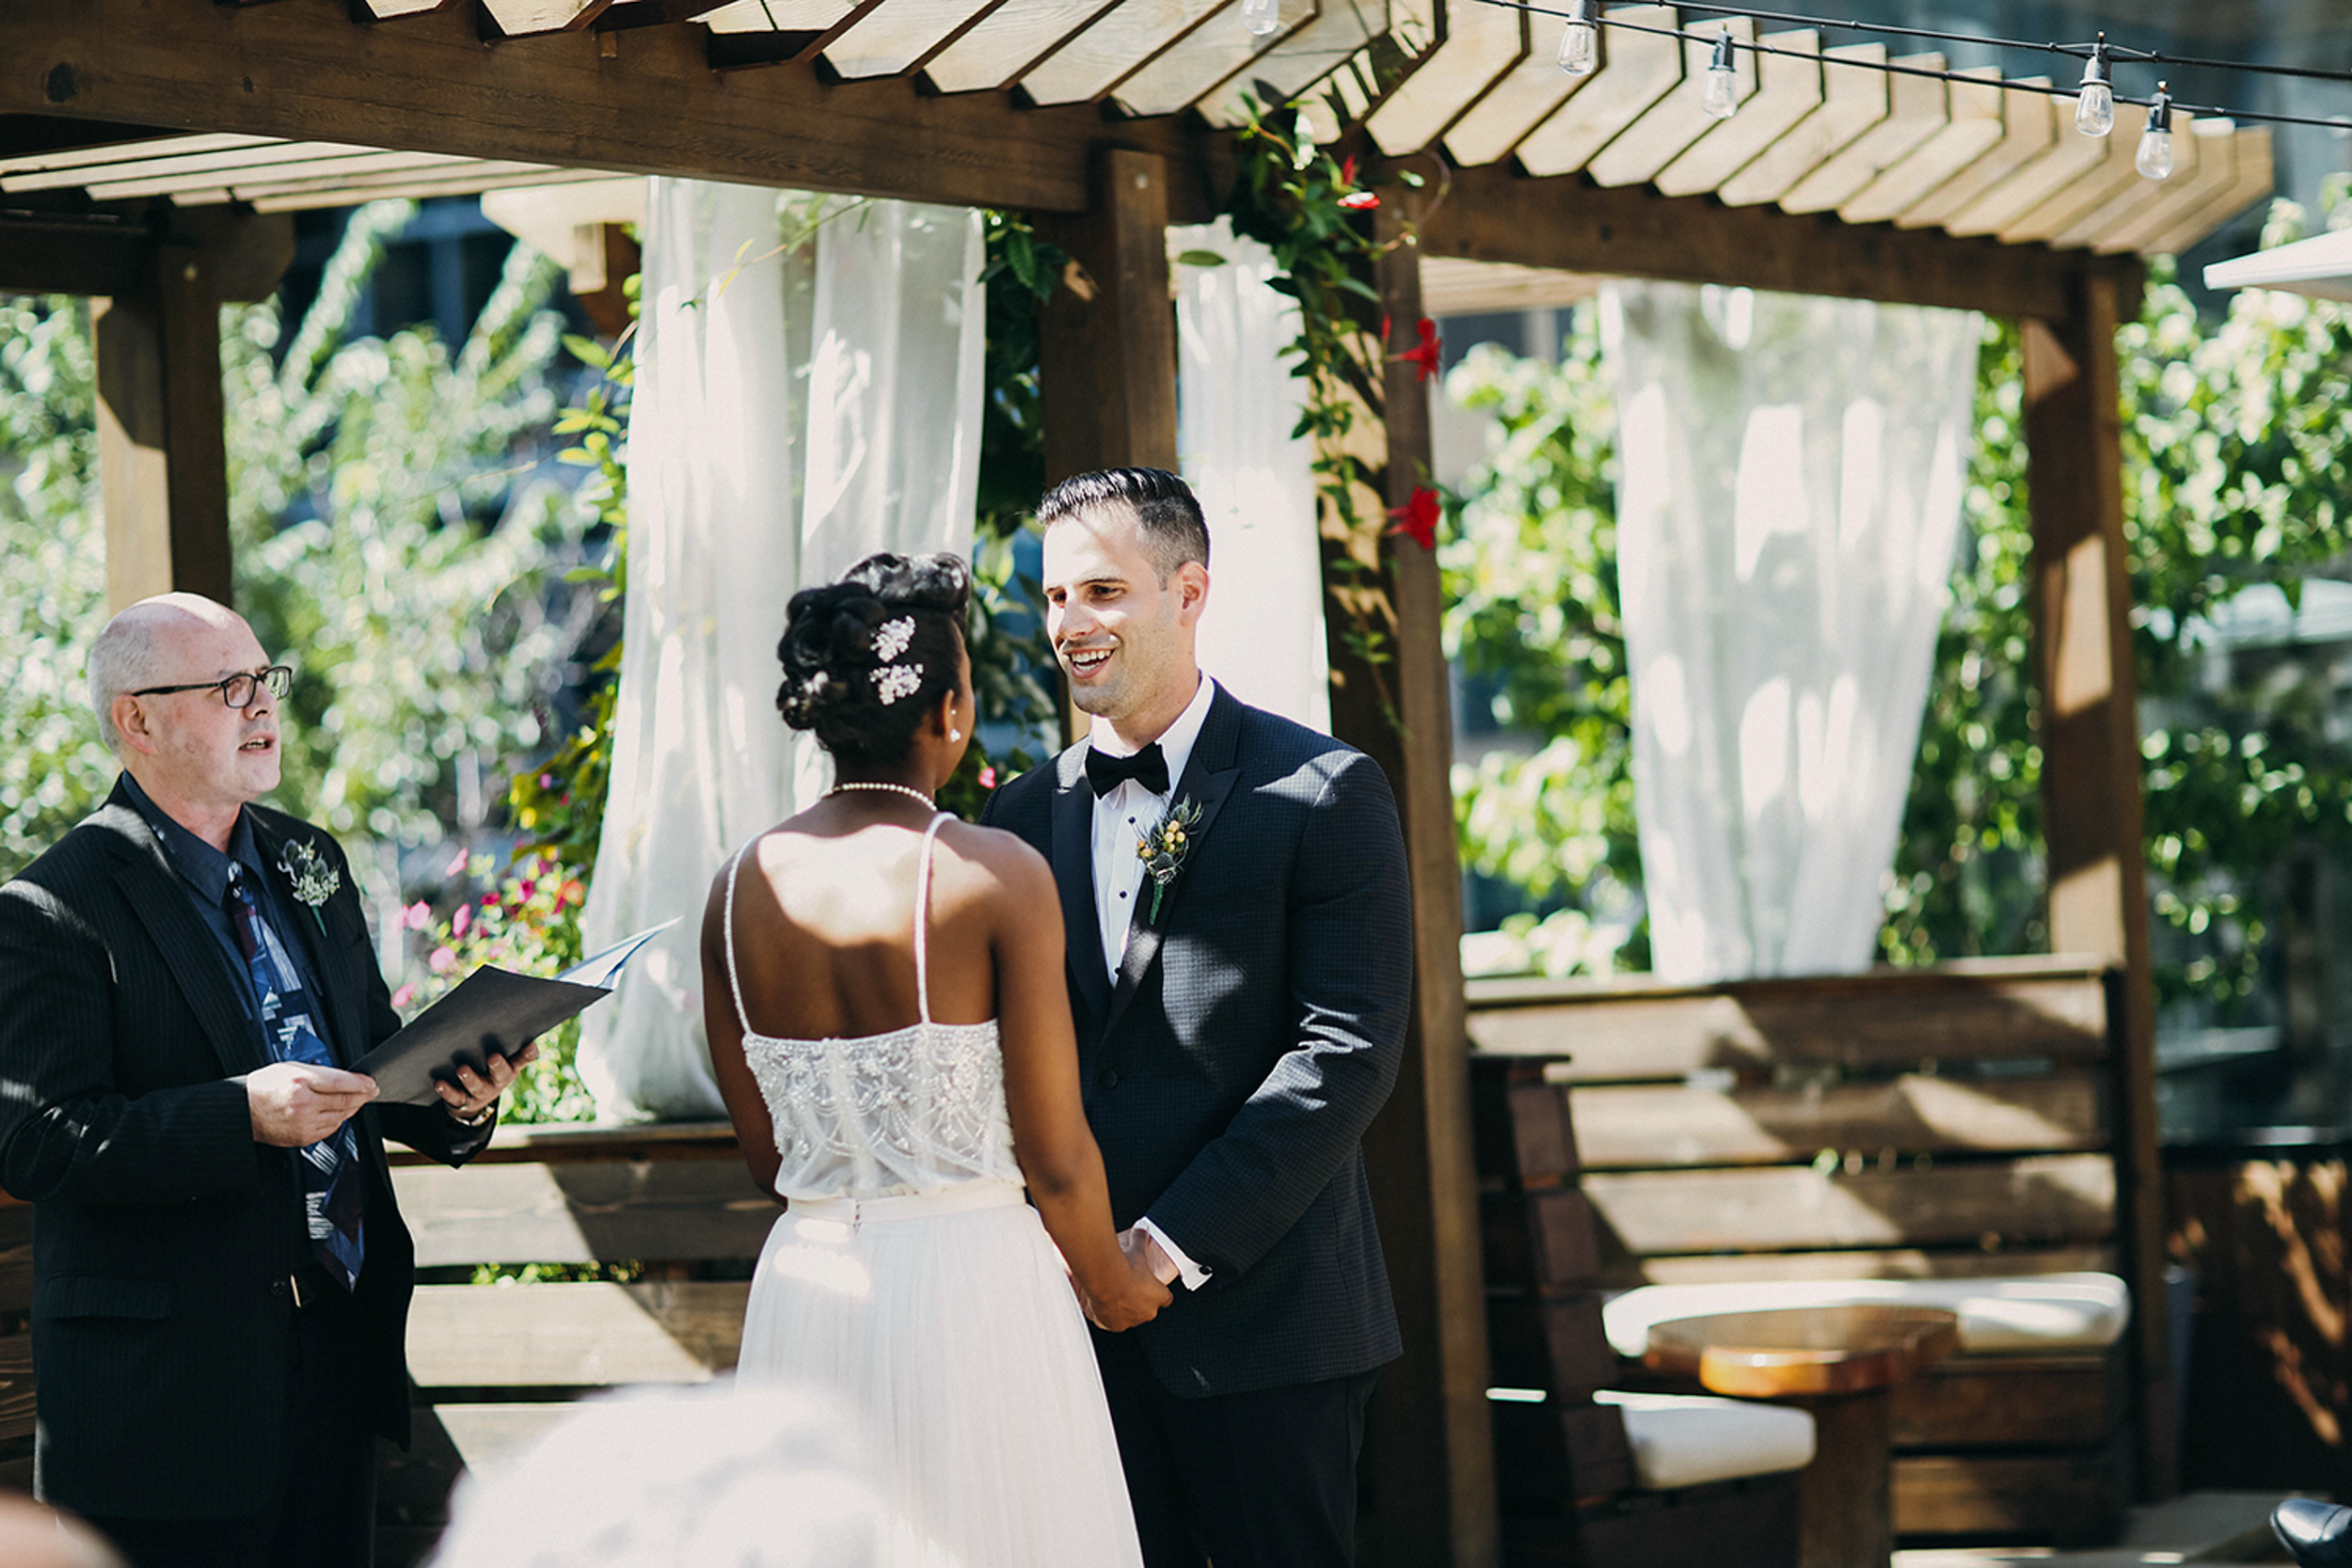 chicago.wedding.urban.intimate.zed451.lake.milton olive park-51.jpg